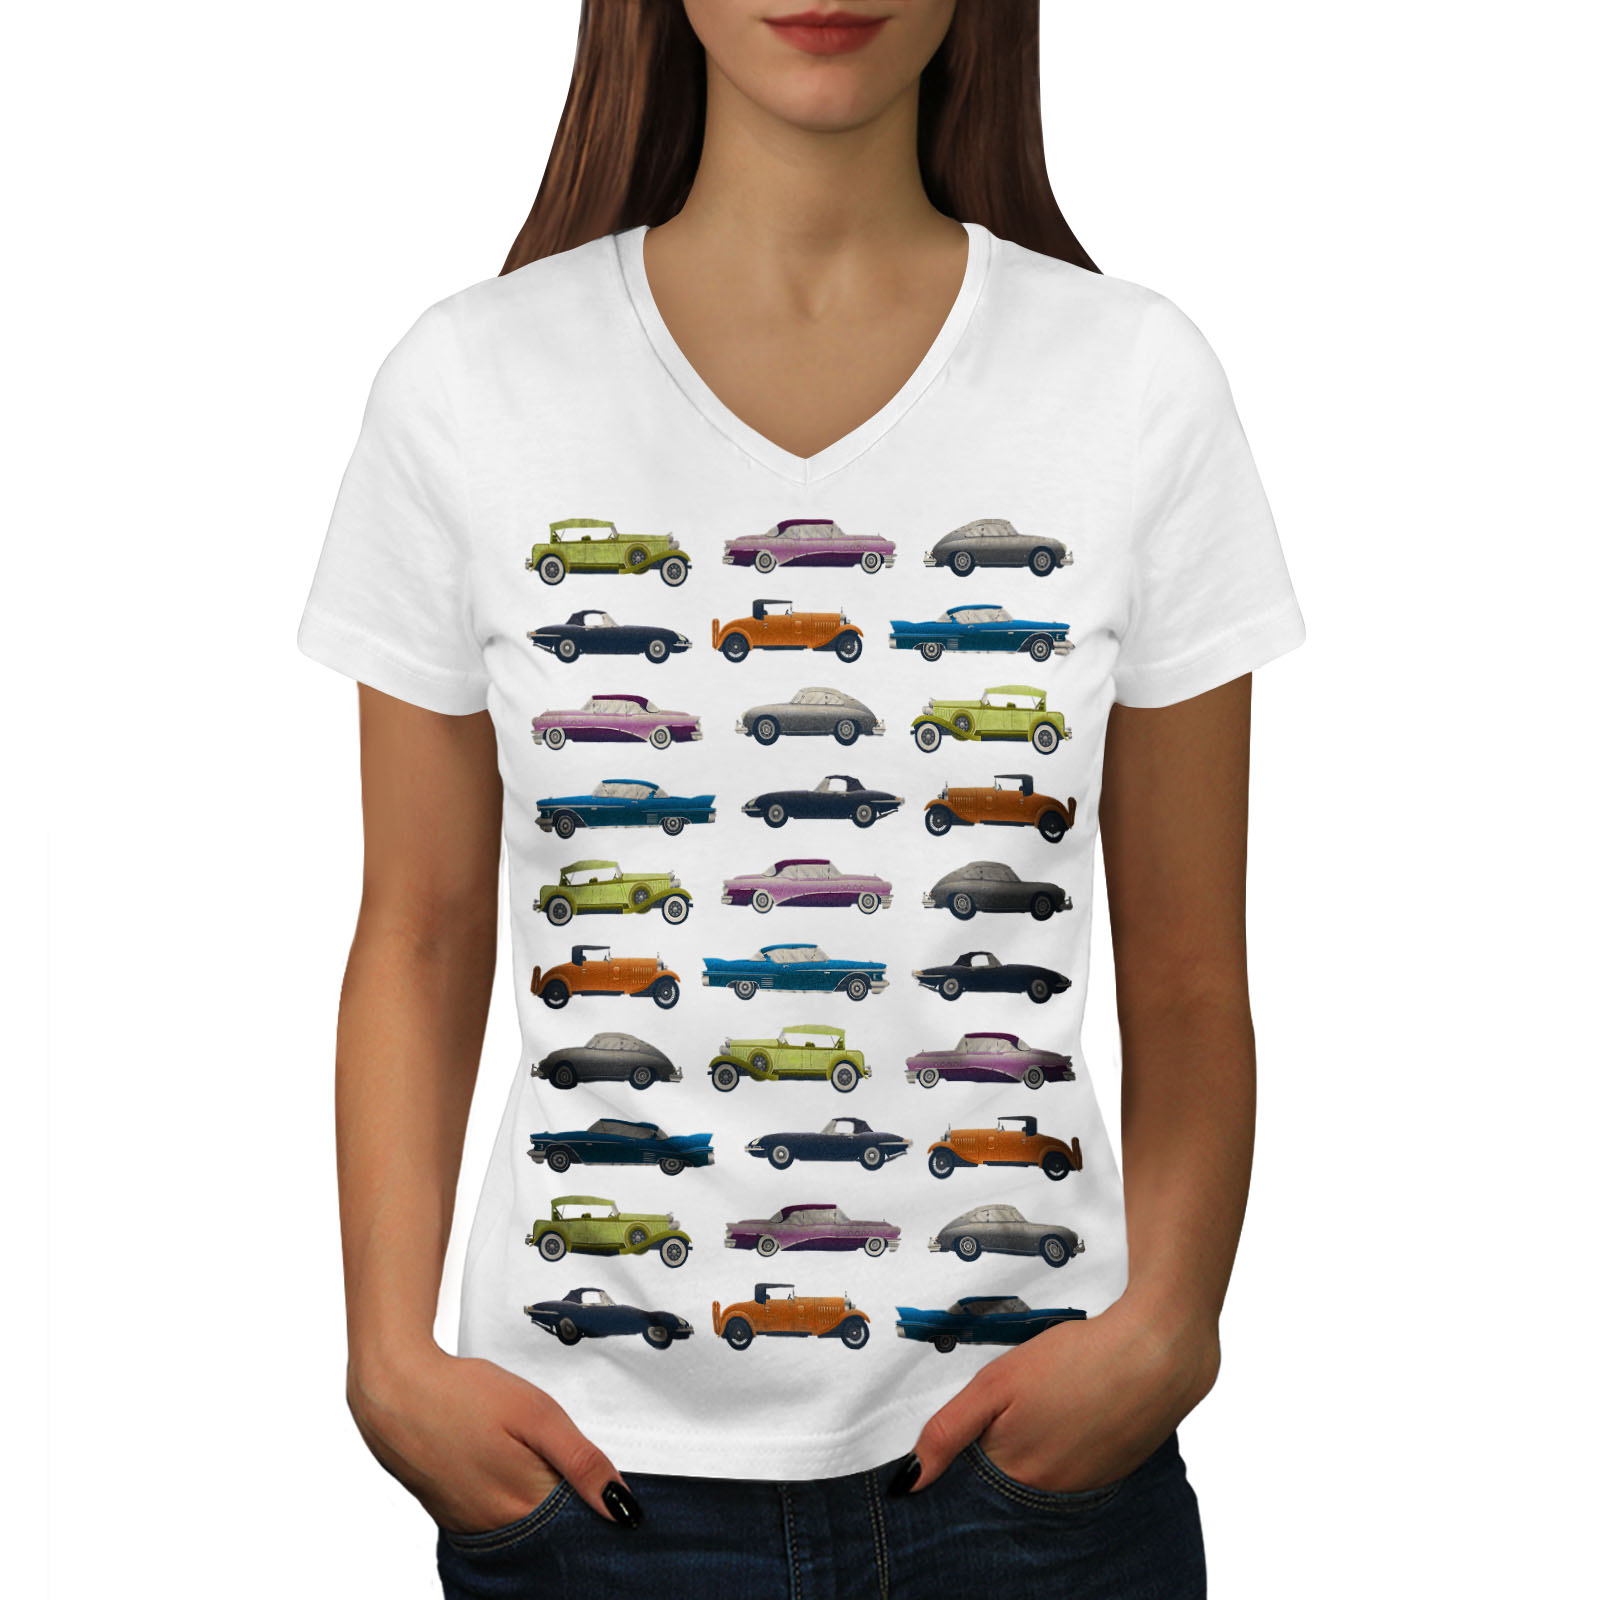 Wellcoda-Classic-Old-Pattern-Car-Womens-V-Neck-T-shirt-Retro-Graphic-Design-Tee thumbnail 7